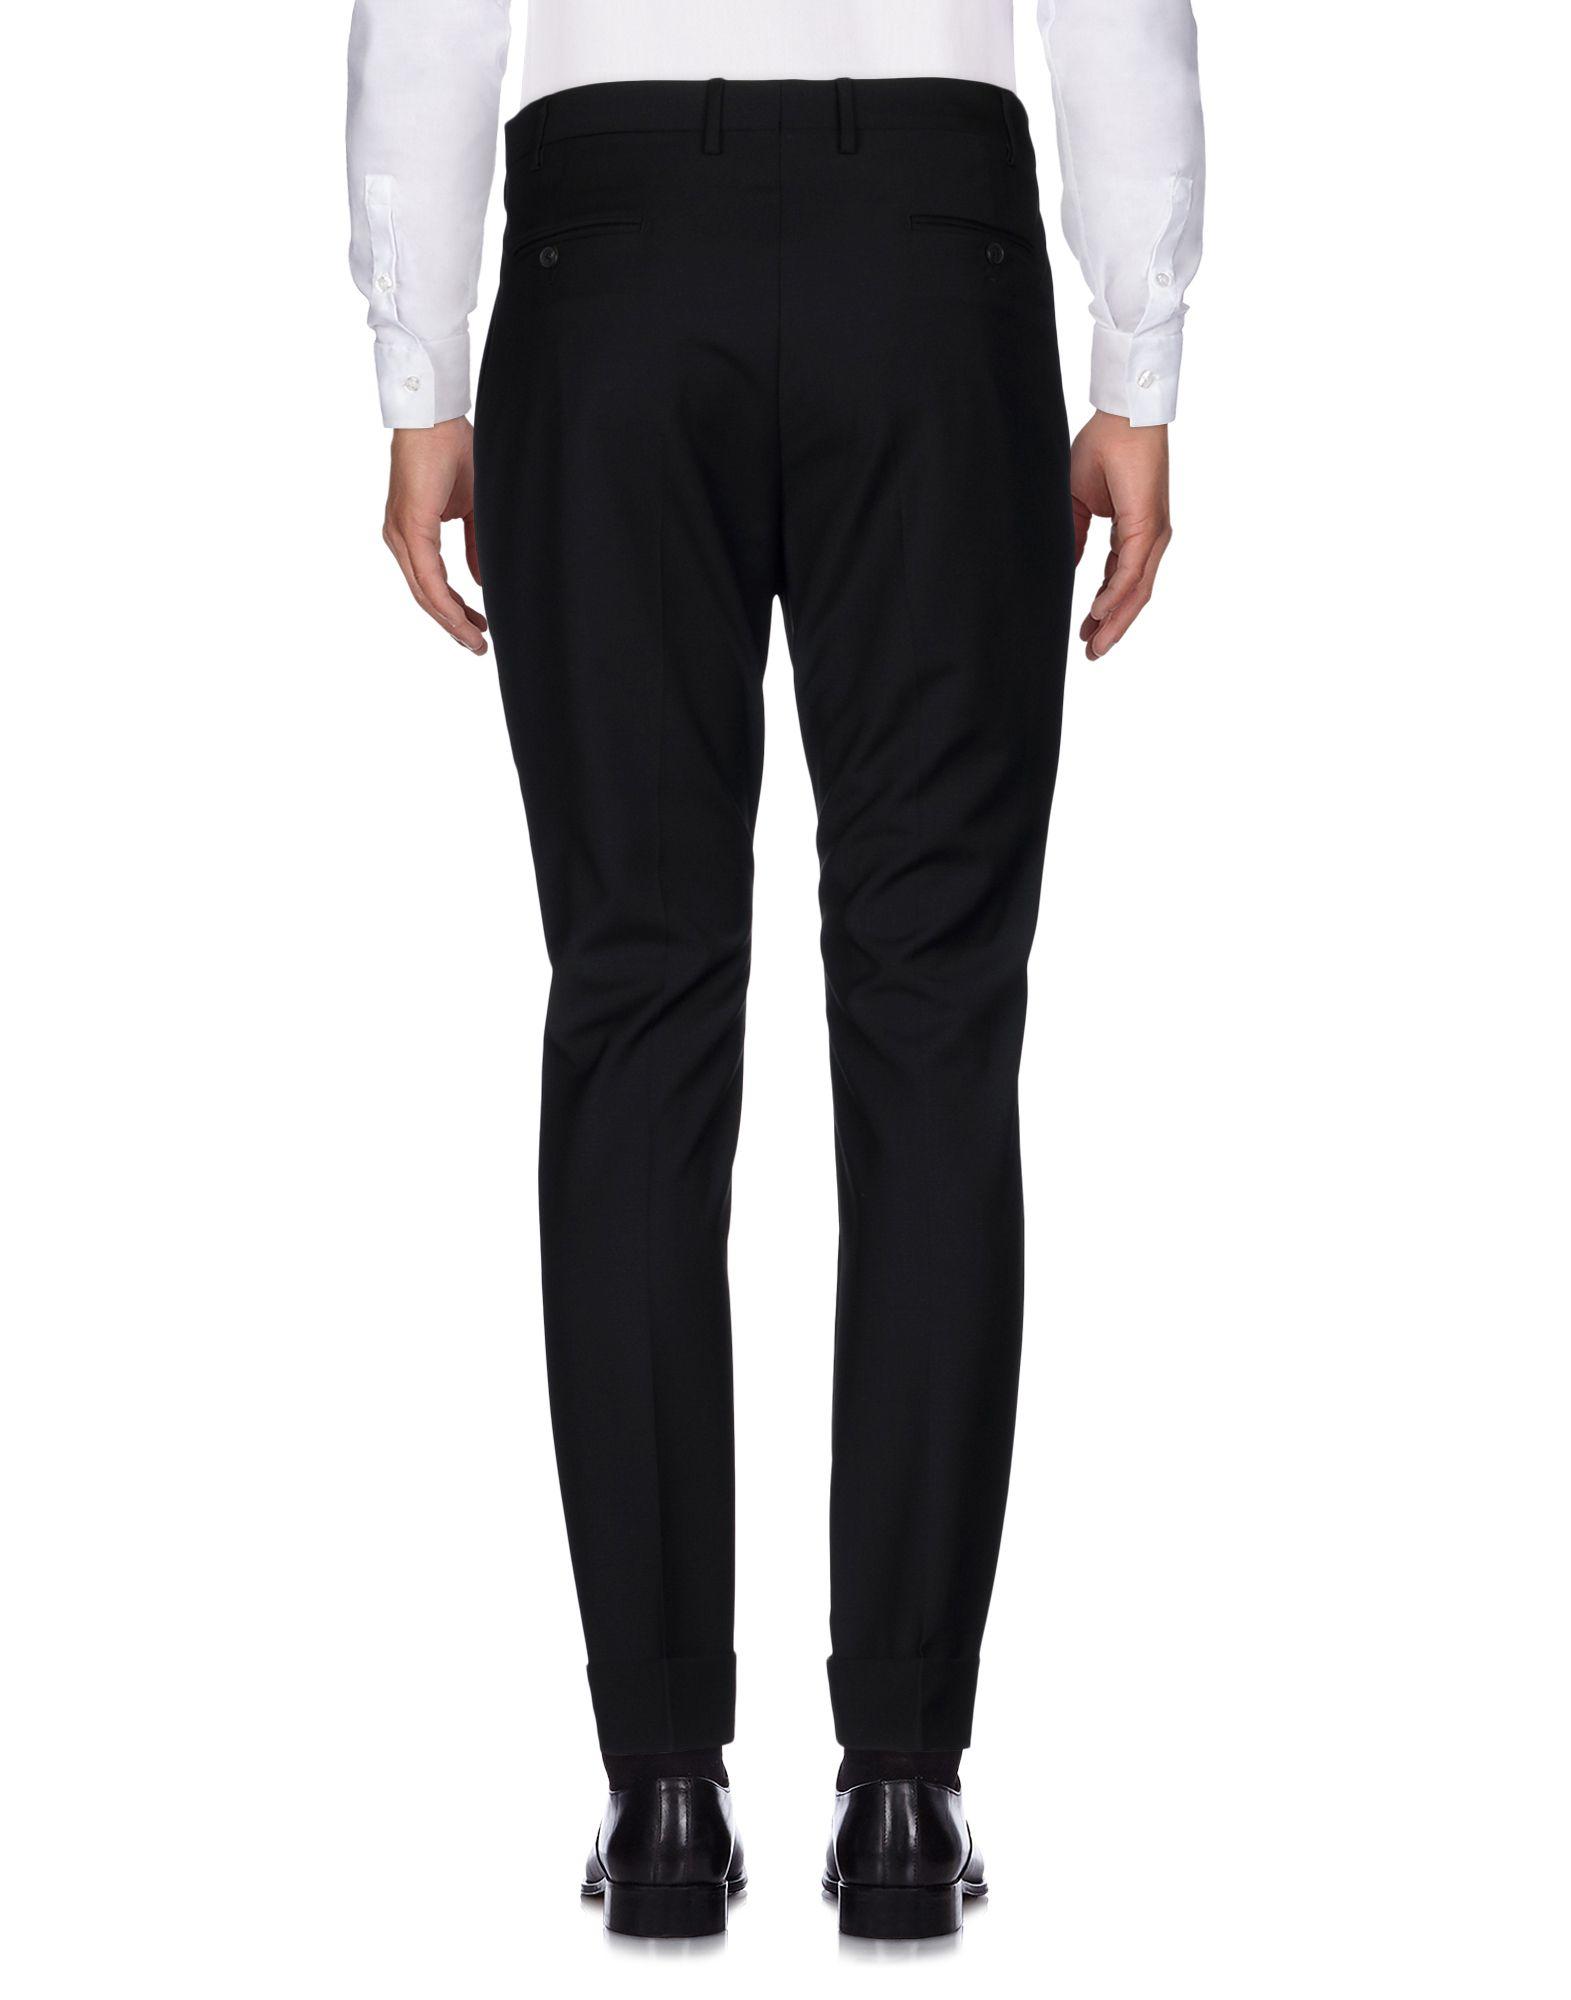 Pantalone Valentino Valentino Pantalone Uomo - 13199434AM b860cb